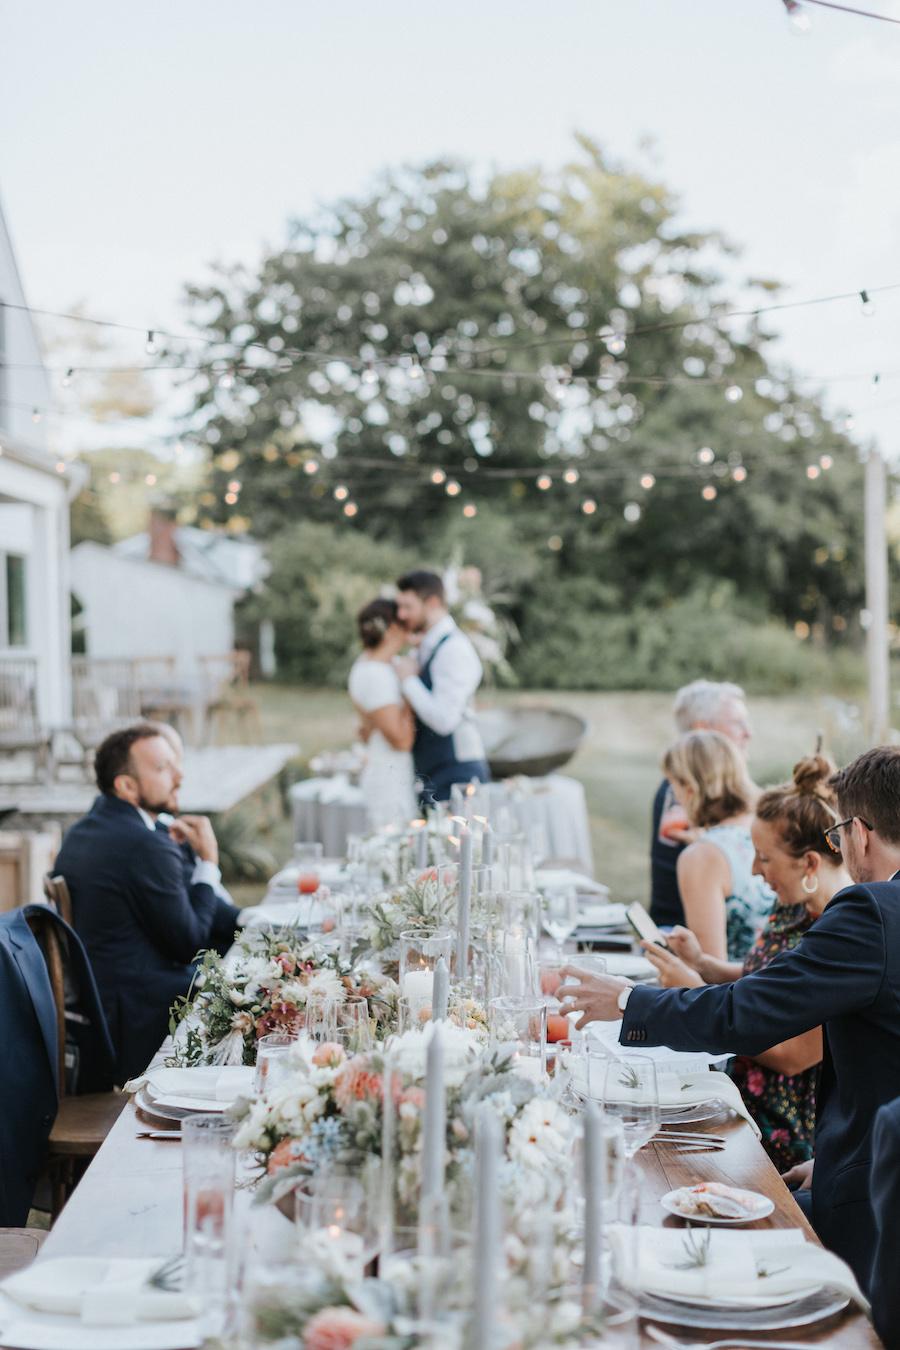 Newlyweds share first dance beneath lights strung overhead in alfresco reception.